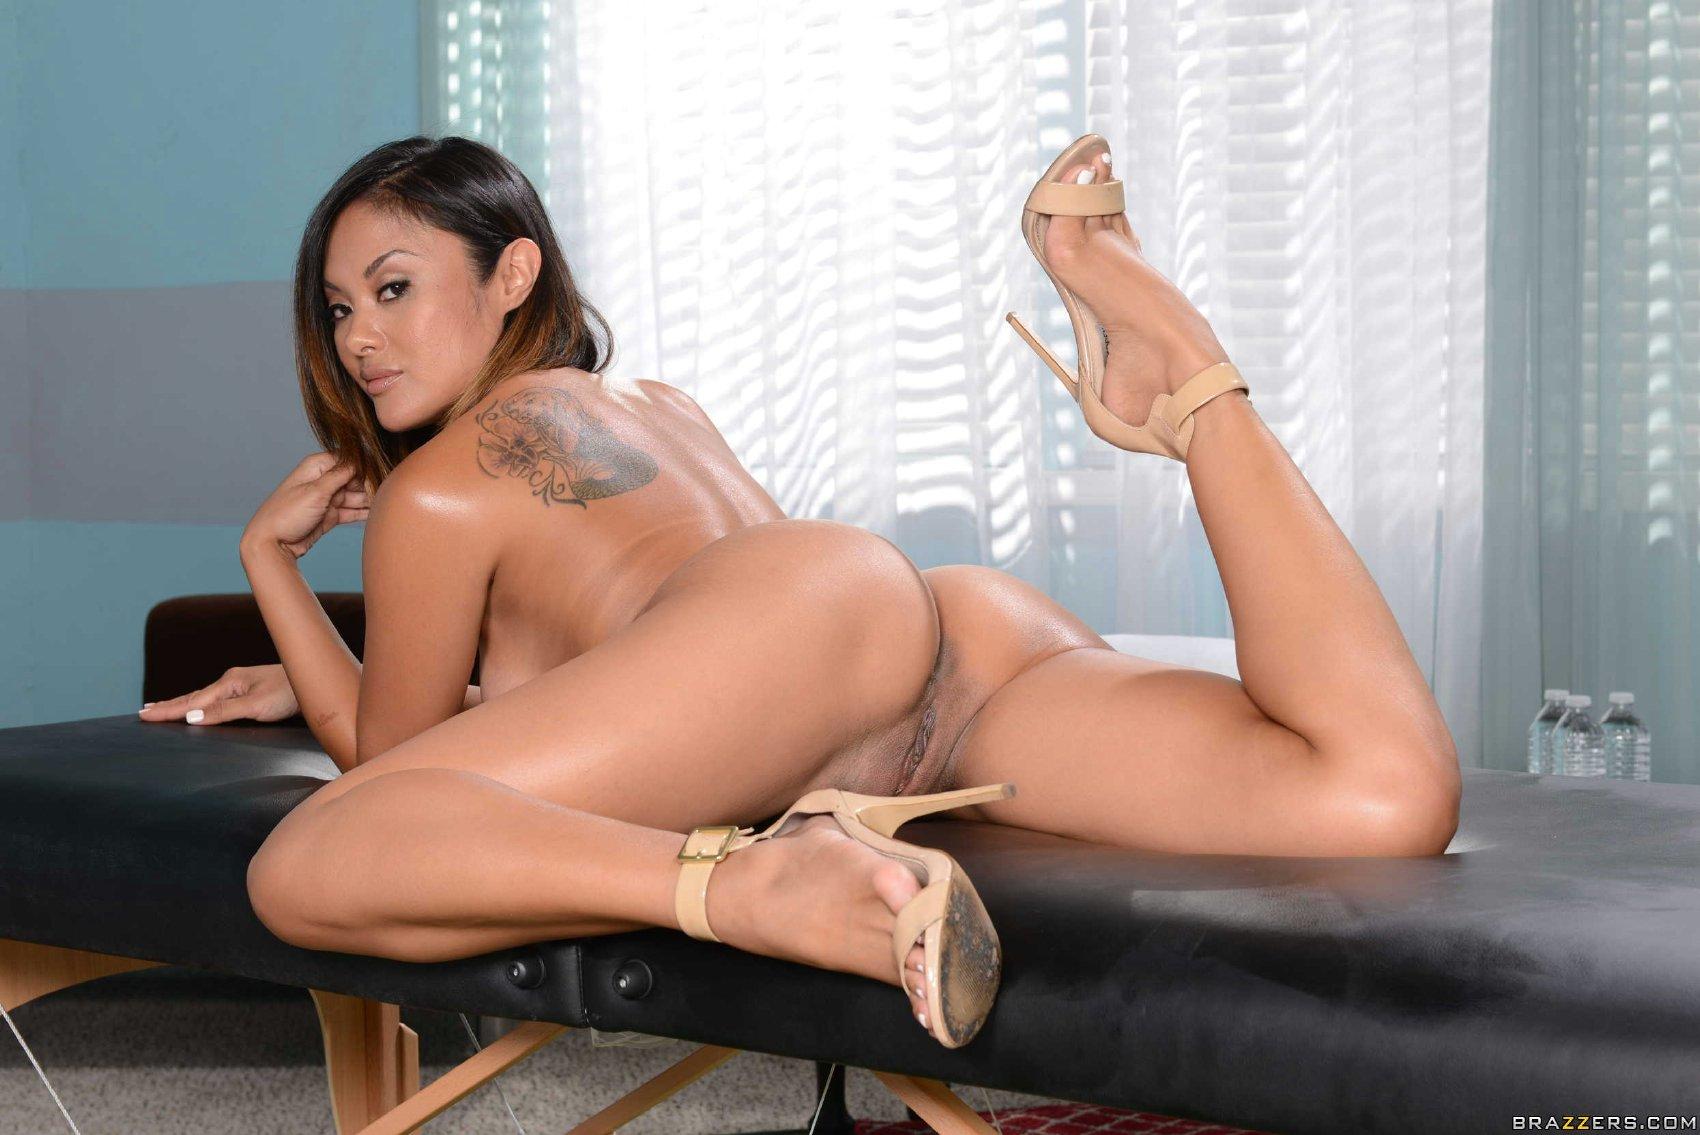 Kaylani lei's porn galery pics